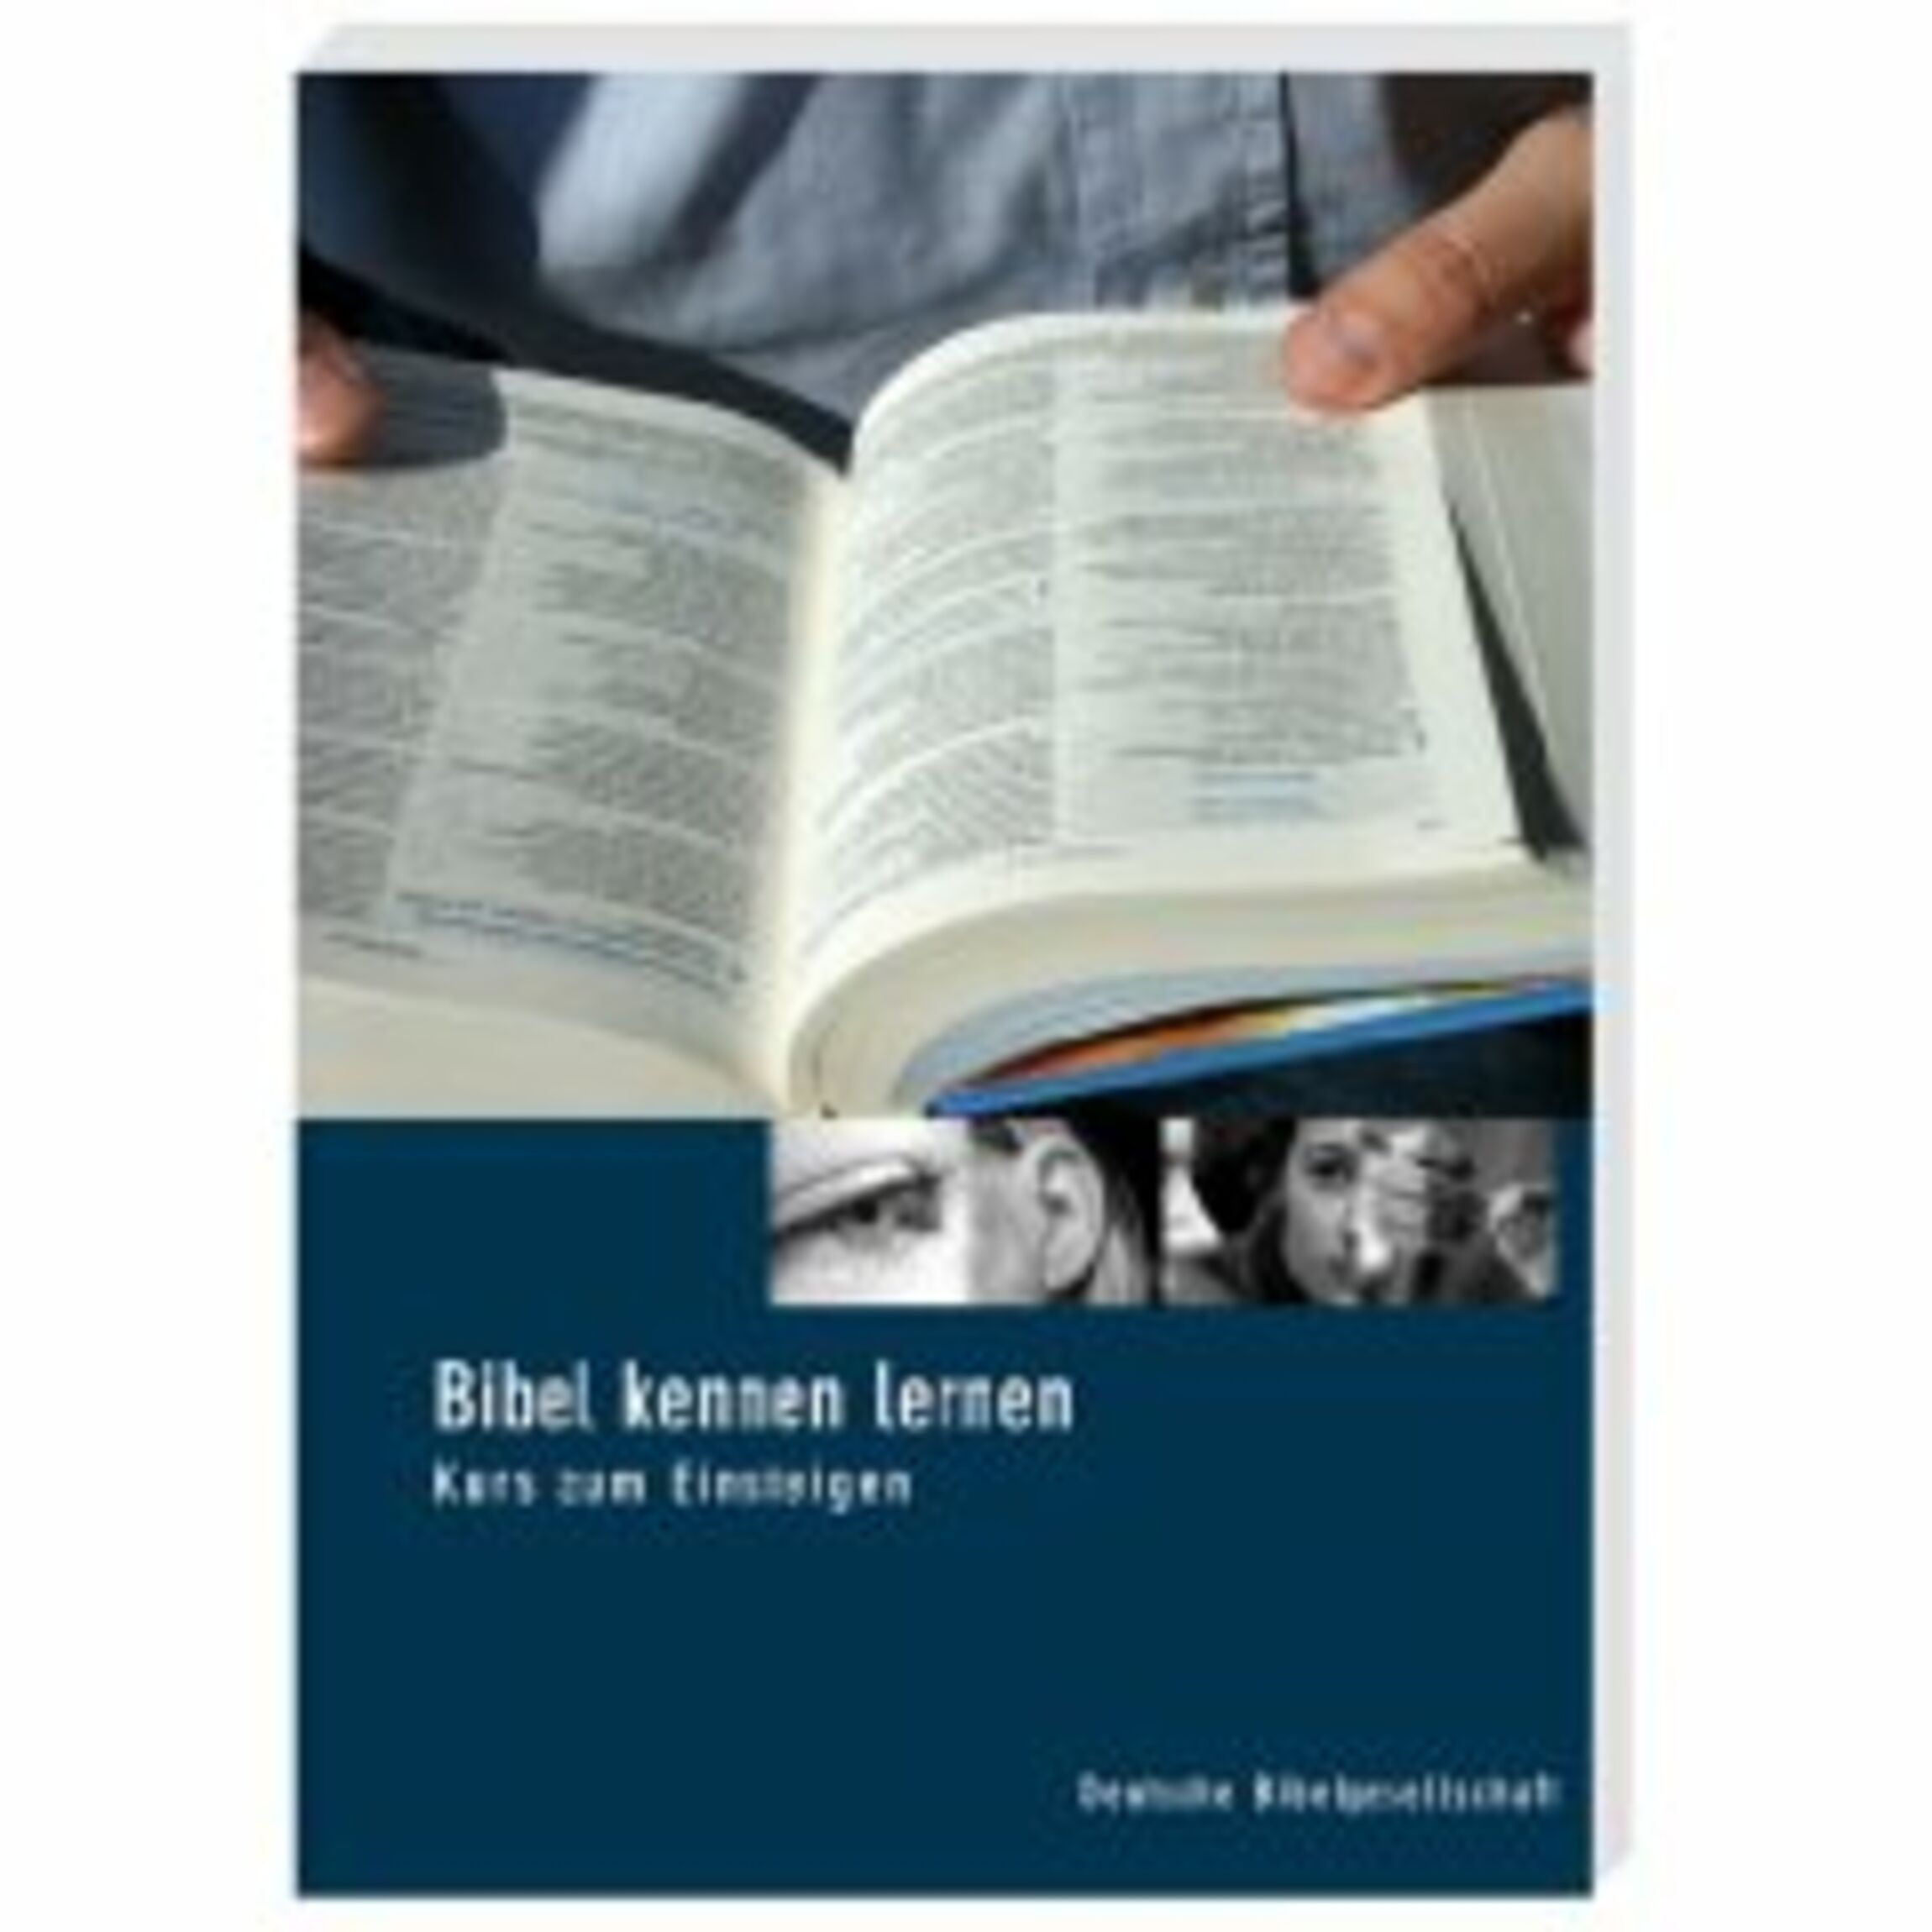 bibel_kennen_lernen